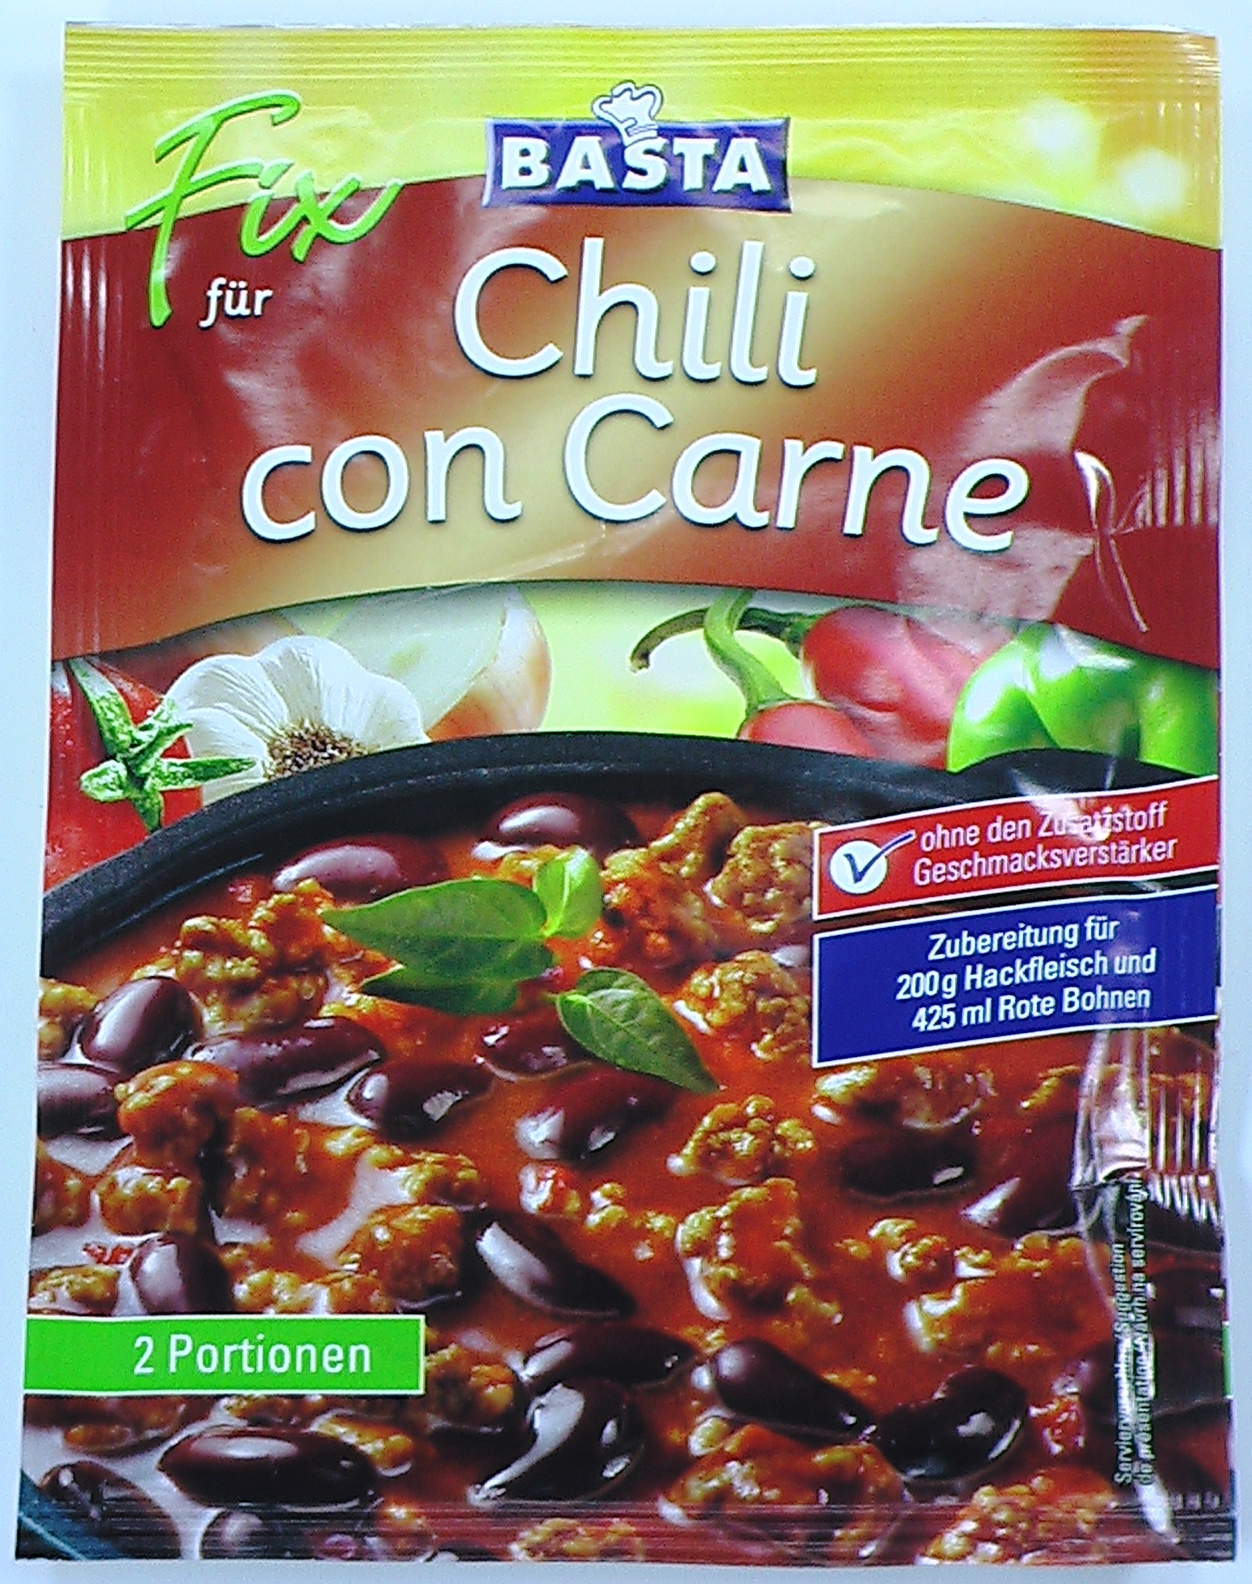 fix f r chili con carne 1 st ck flora gew rze saucen ungek hlt haltbar lebensmittel. Black Bedroom Furniture Sets. Home Design Ideas